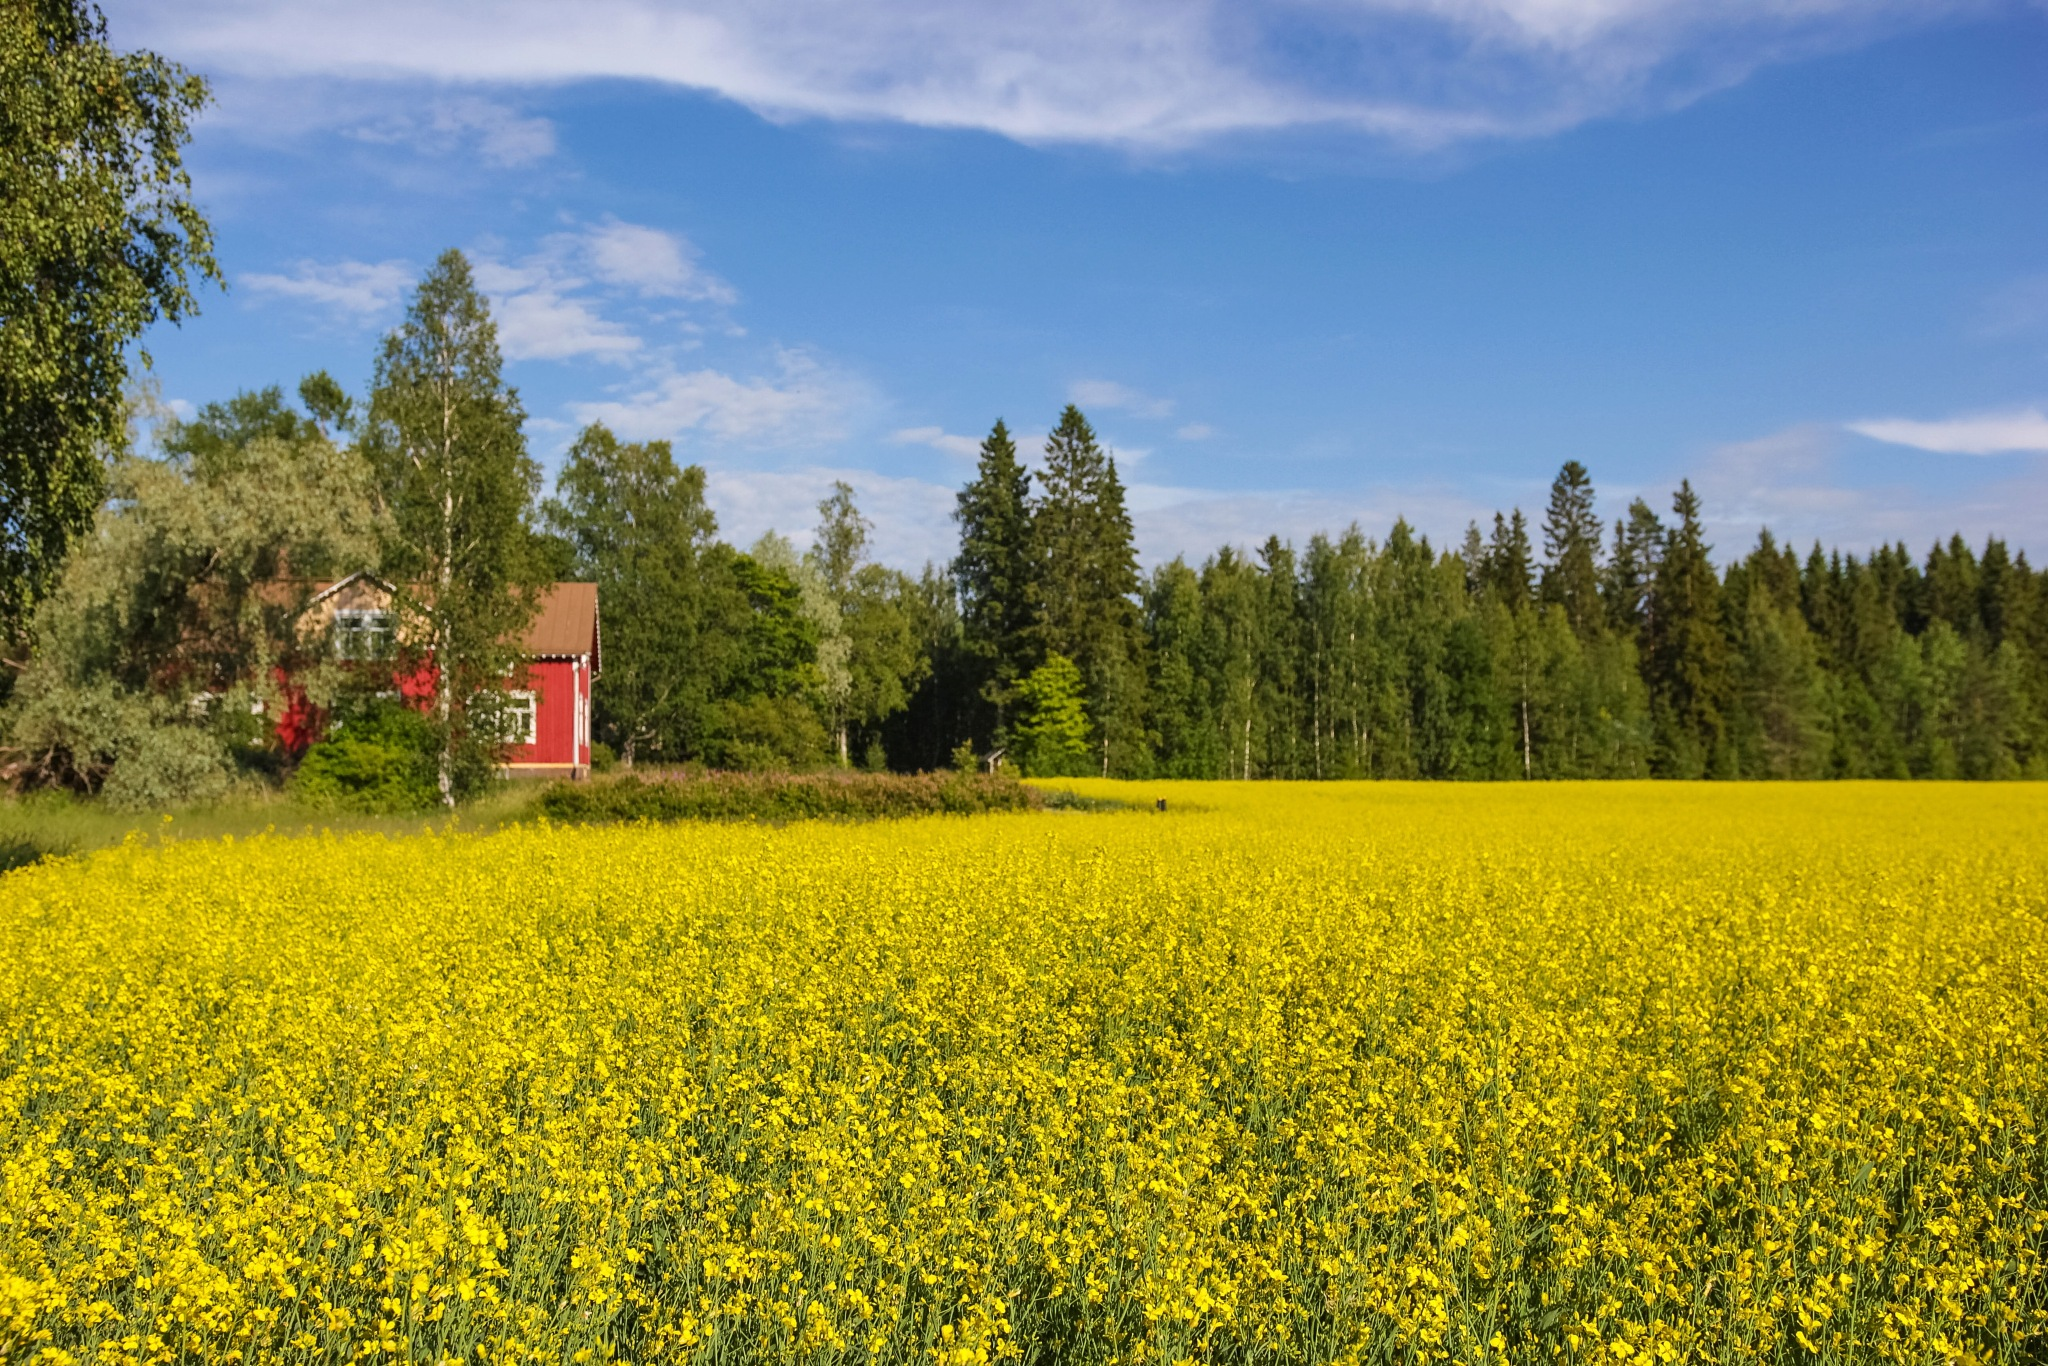 Finnish views by Joonas Pöytäniemi